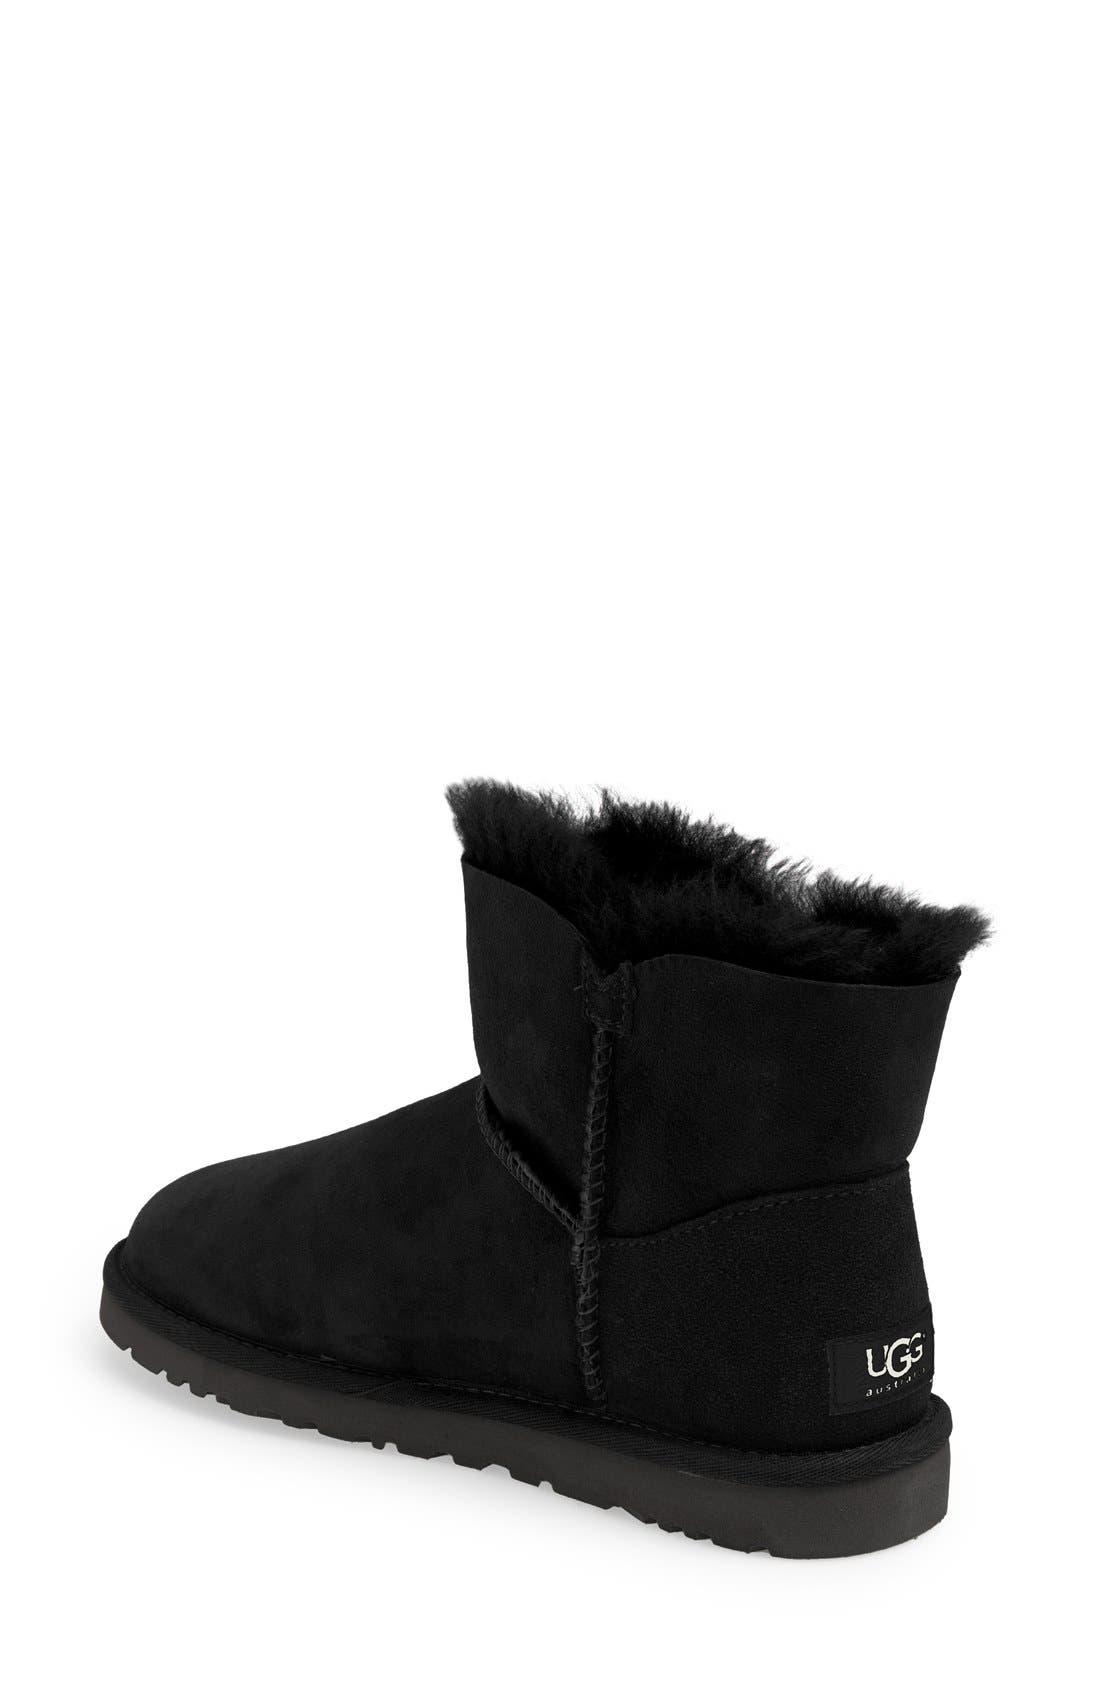 Alternate Image 2  - UGG® 'Mini Bailey Button' Boot (Women)